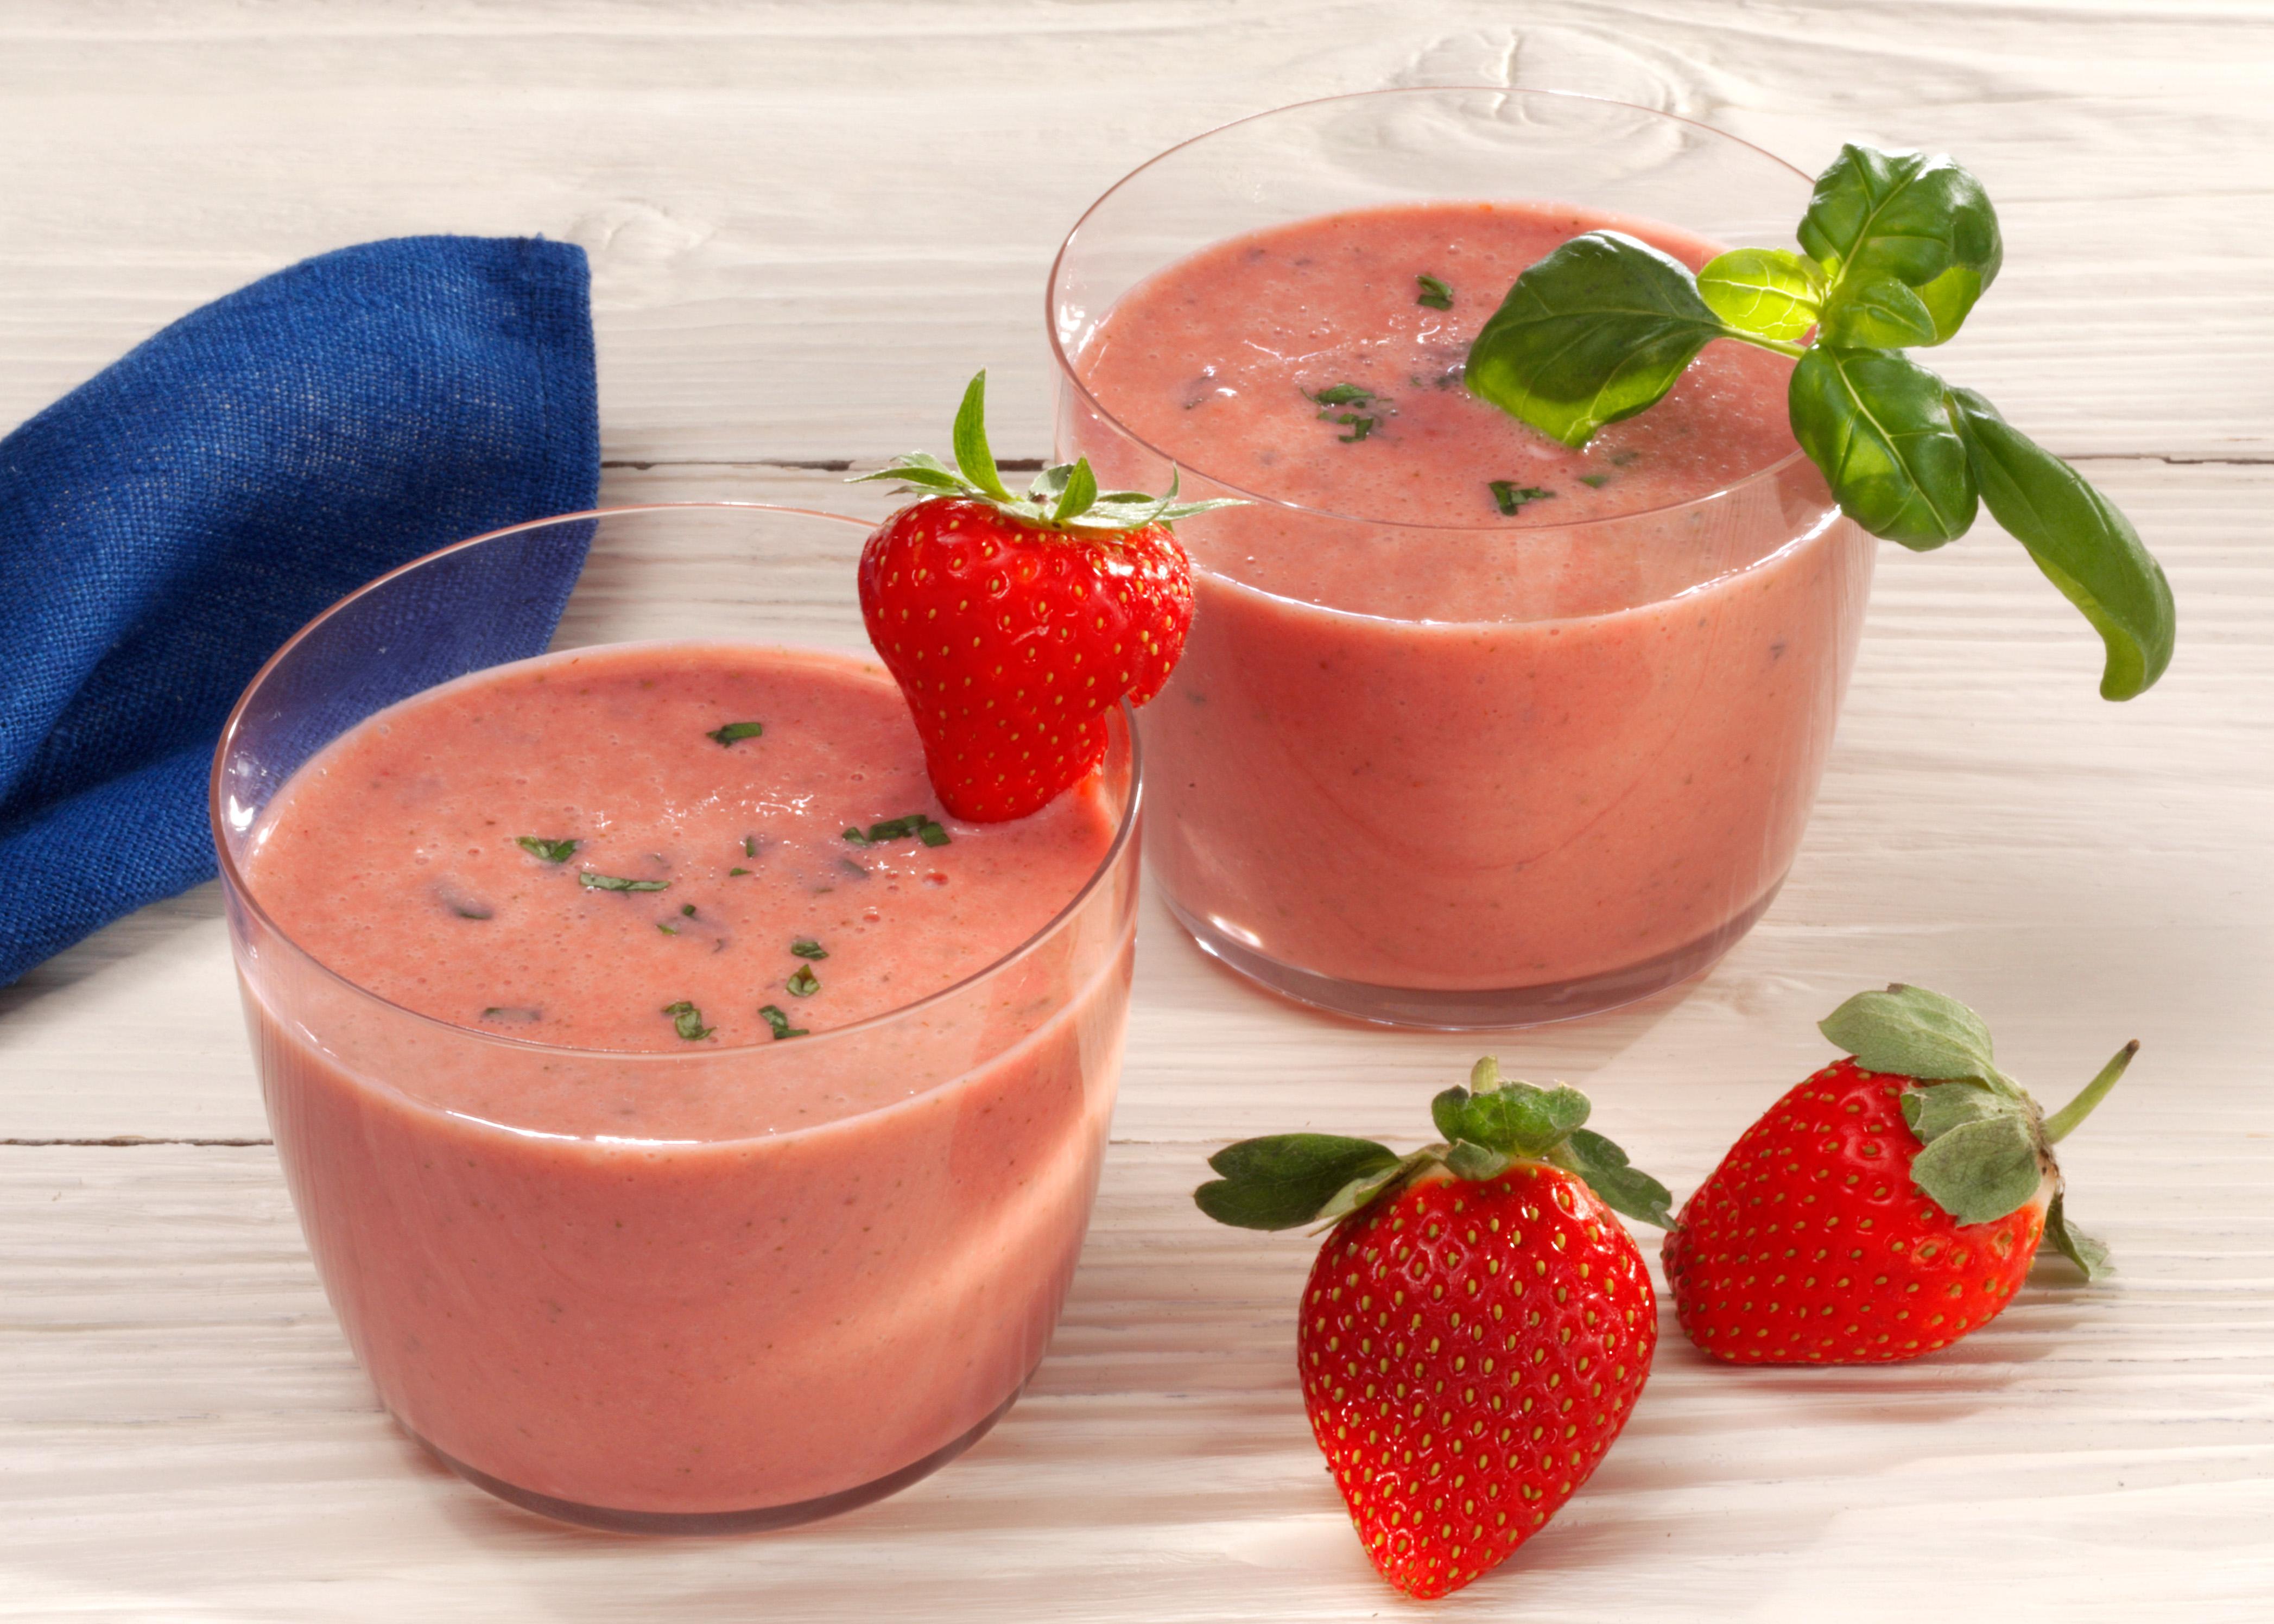 Erdbeer-Basilikum-Joghurt-Drink mit Holunderblütensirup - Getränke ...